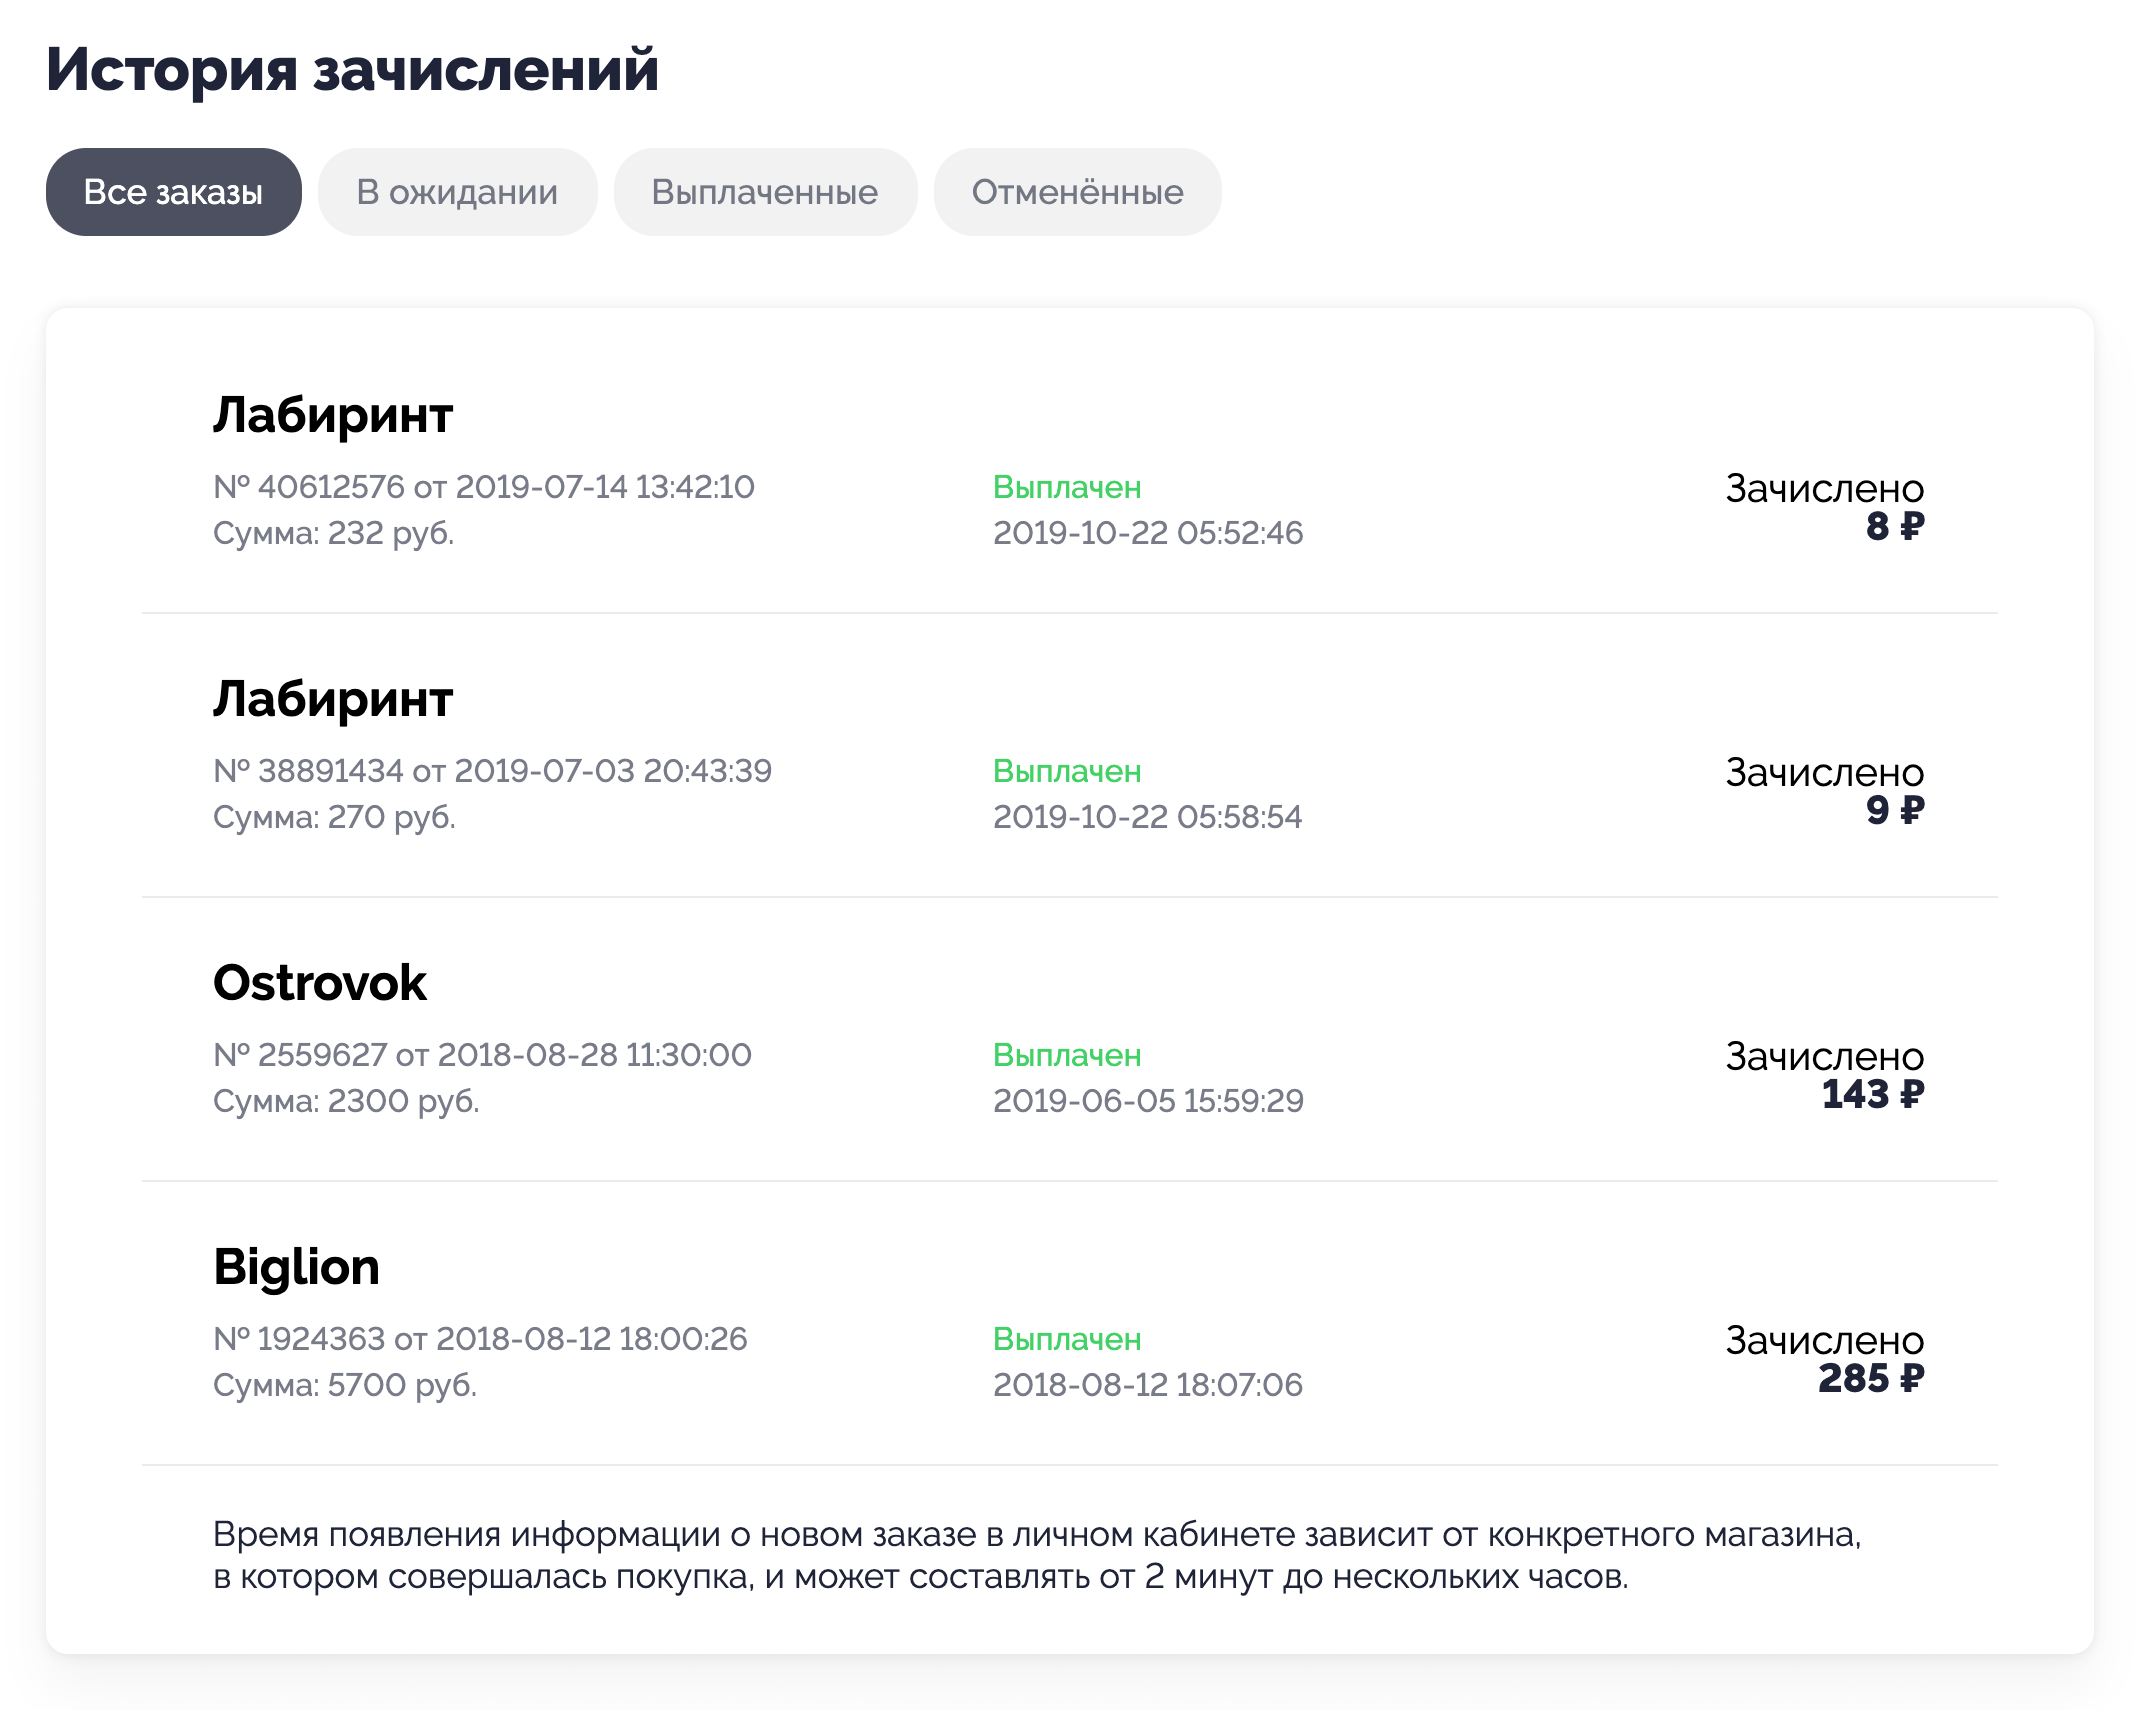 Я бронировала отель в Керчи за 2300<span class=ruble>Р</span> на сайте-партнере. 143<span class=ruble>Р</span> кэшбэка перечислили мне на баланс